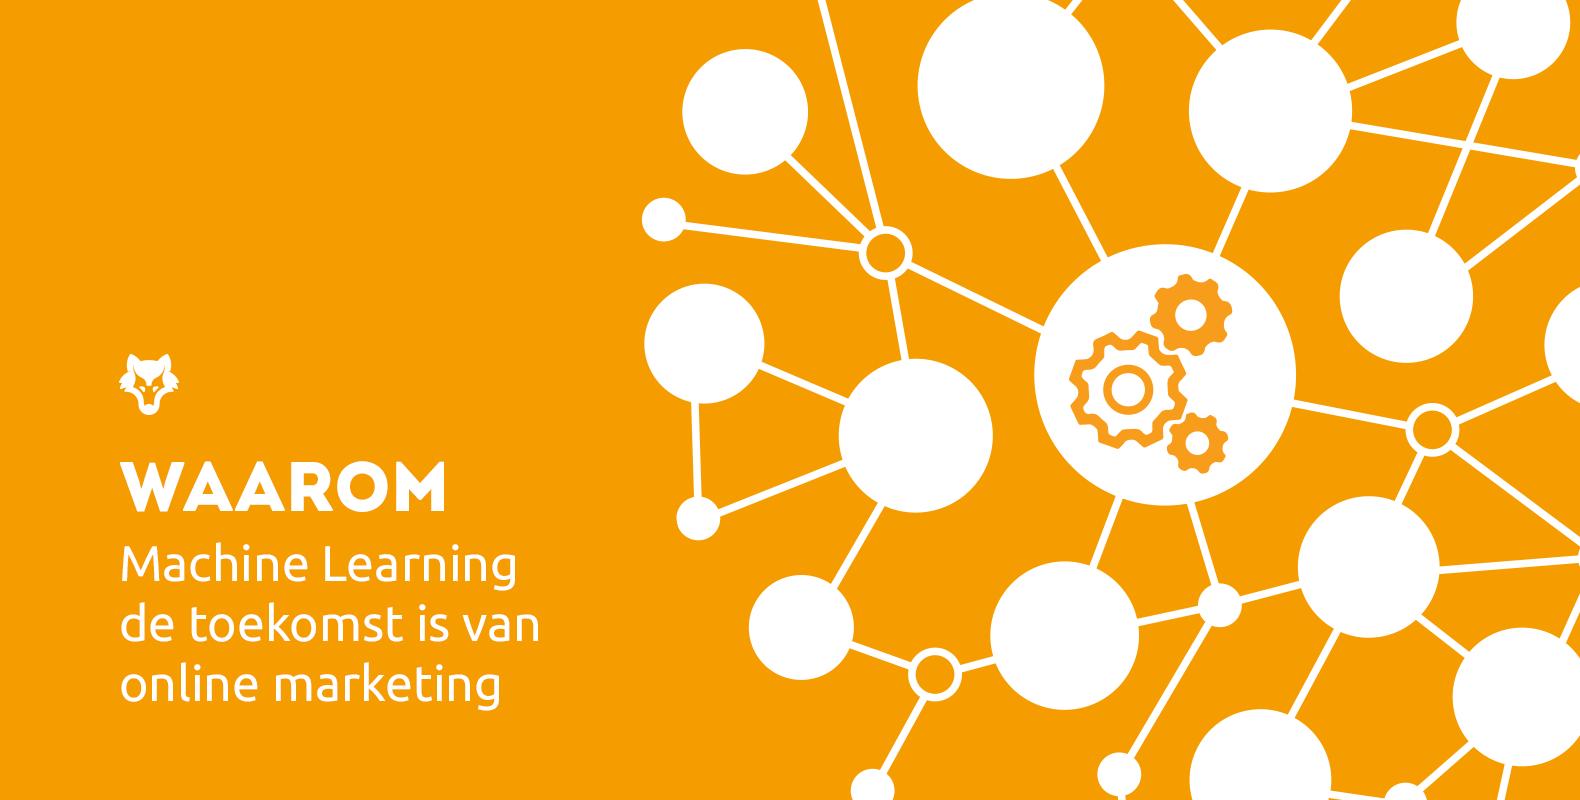 Waarom machine learning de toekomst is van online marketing